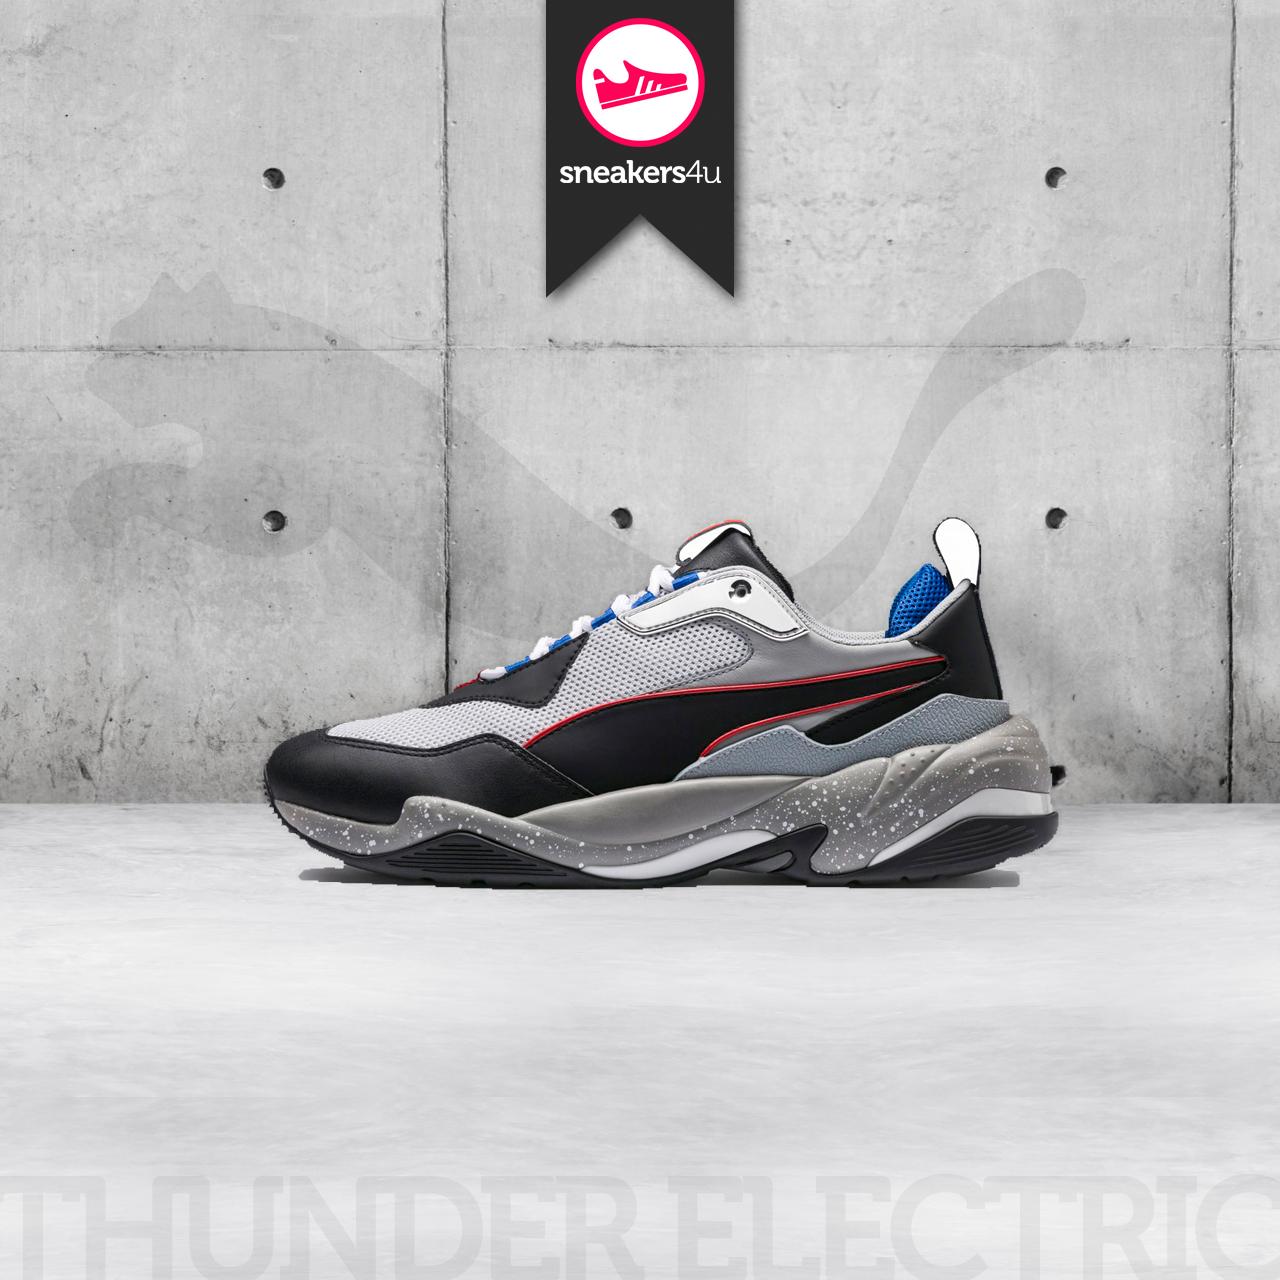 Puma Thunder Electric | dames, heren & kids | Sneakers4u